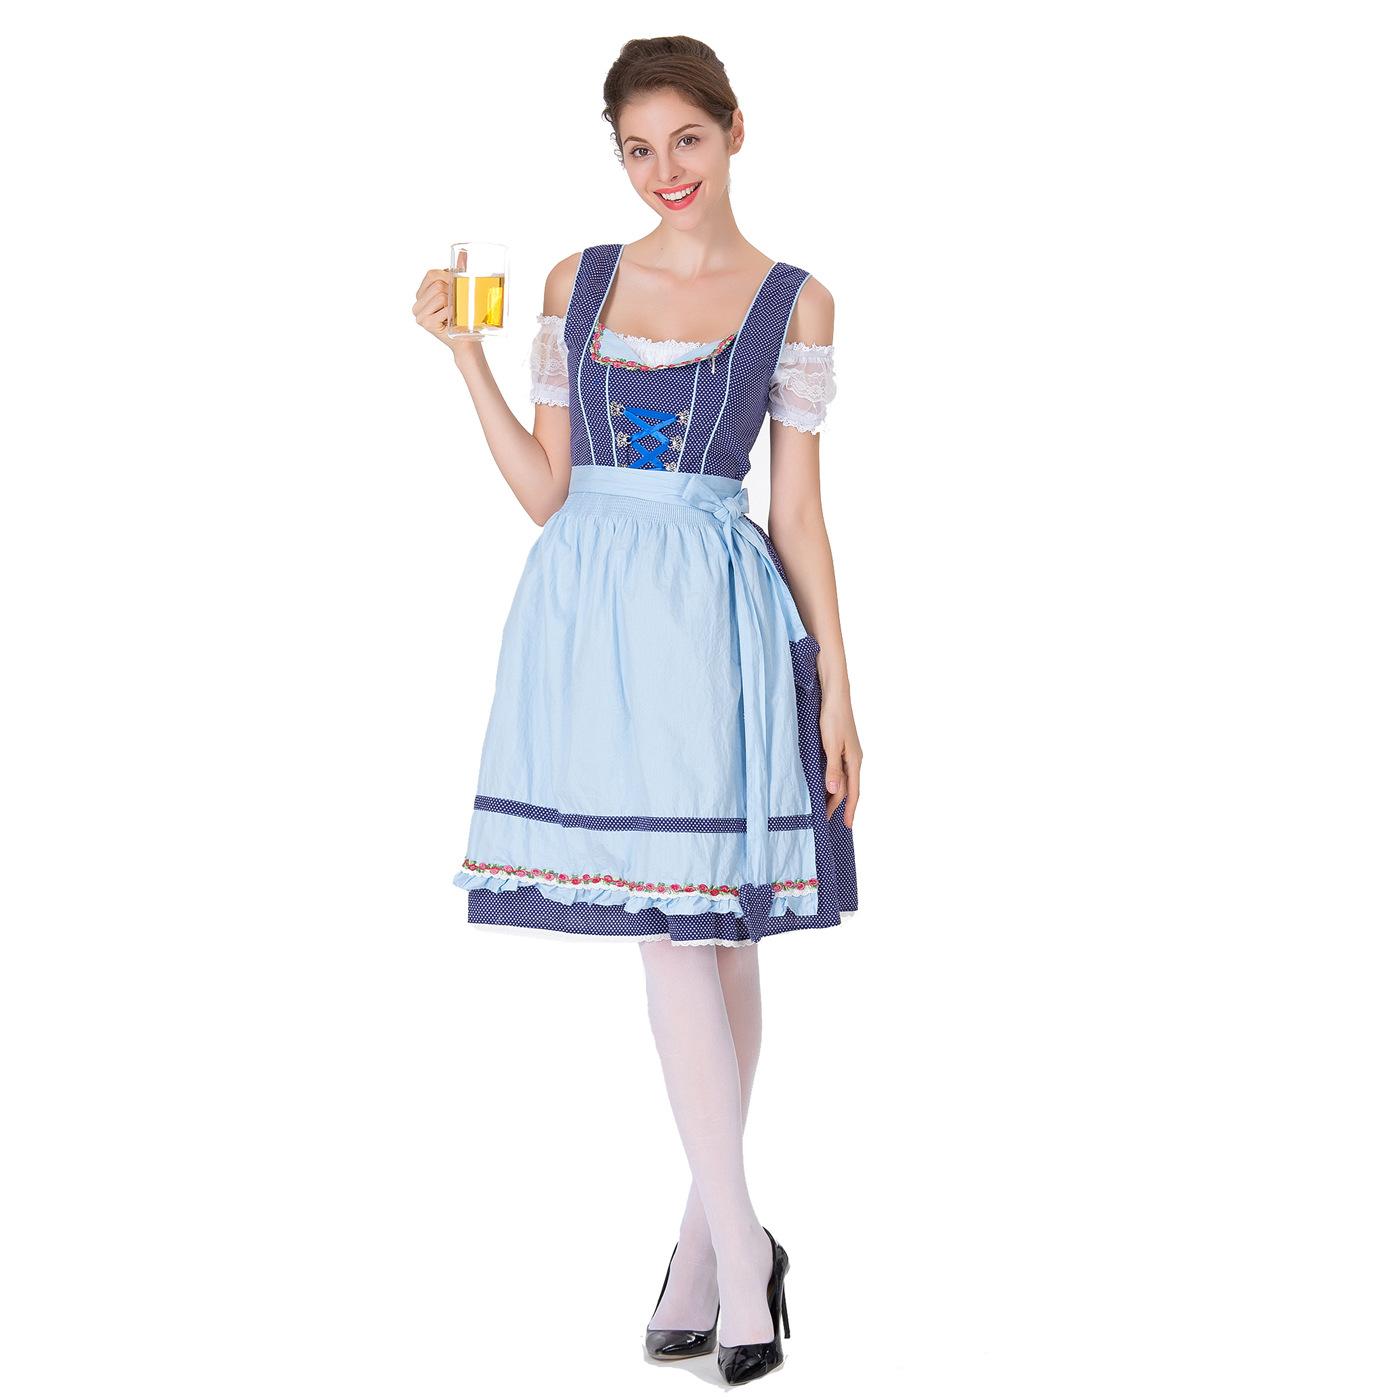 Women Large Size Oktoberfest Style Dirndl Dress Bavarian Style Waitress Halloween Costume blue_XXXL